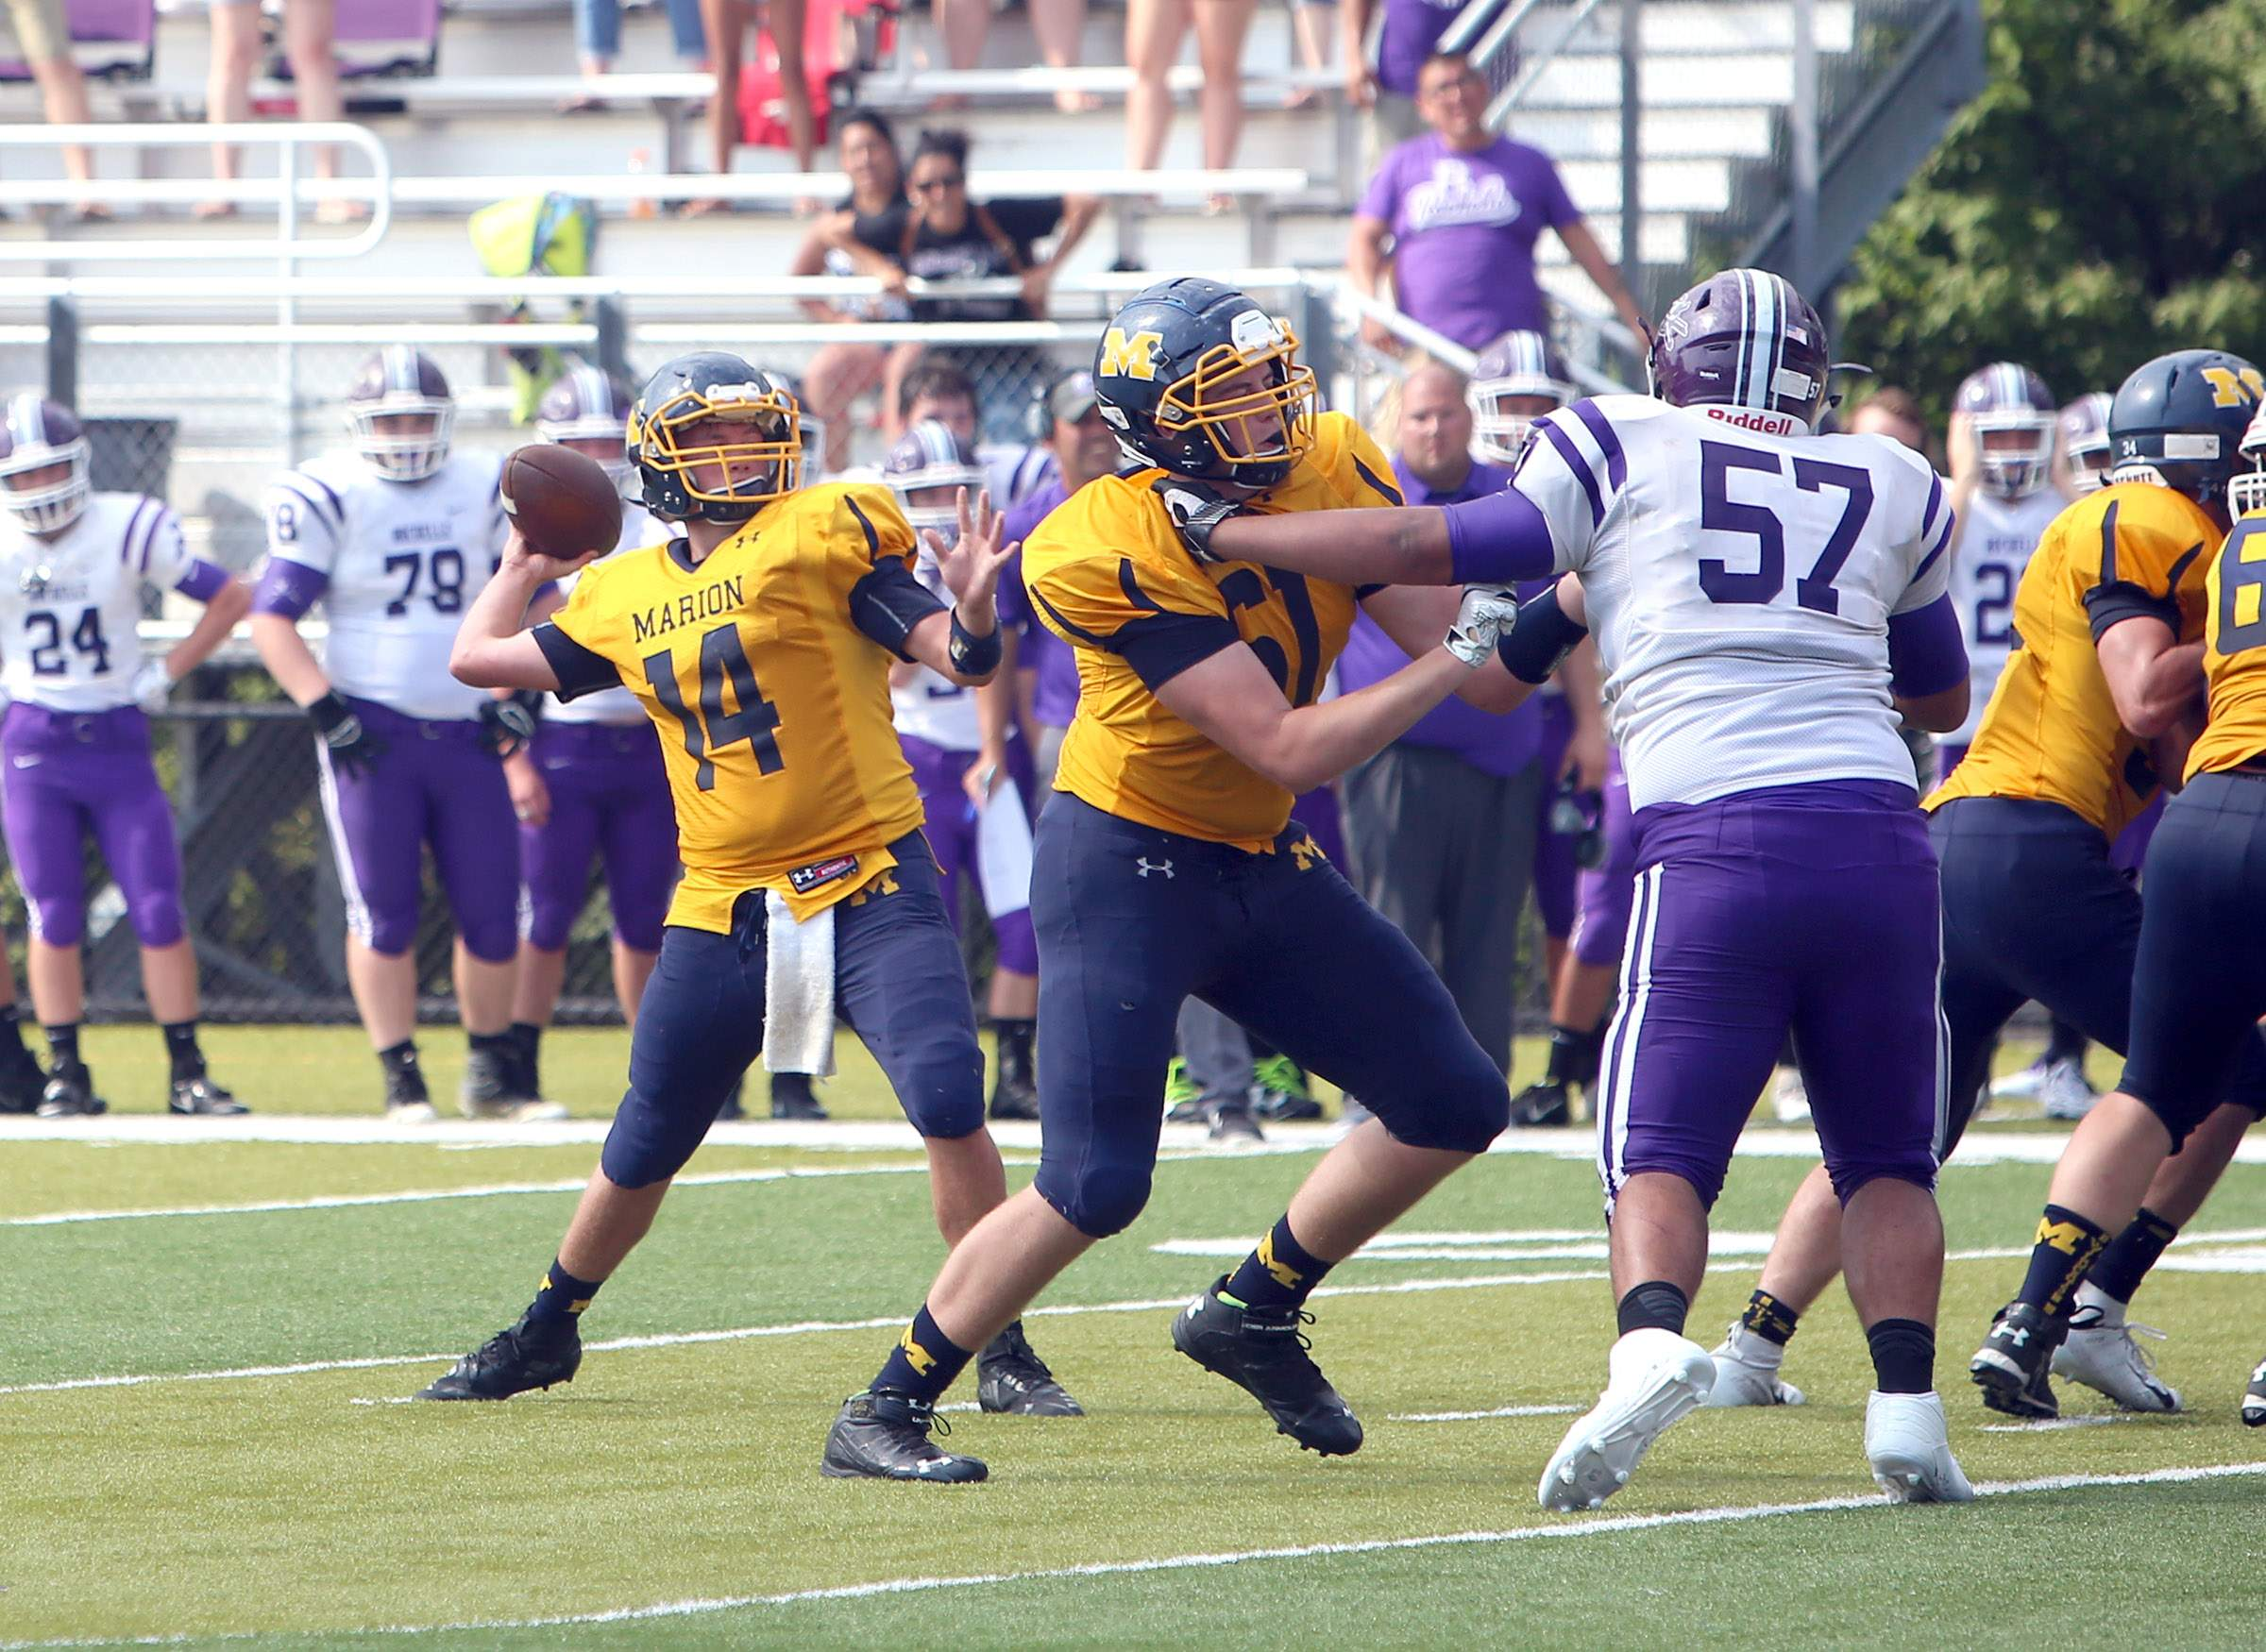 Boston Ziegler throws the game-winning touchdown pass.